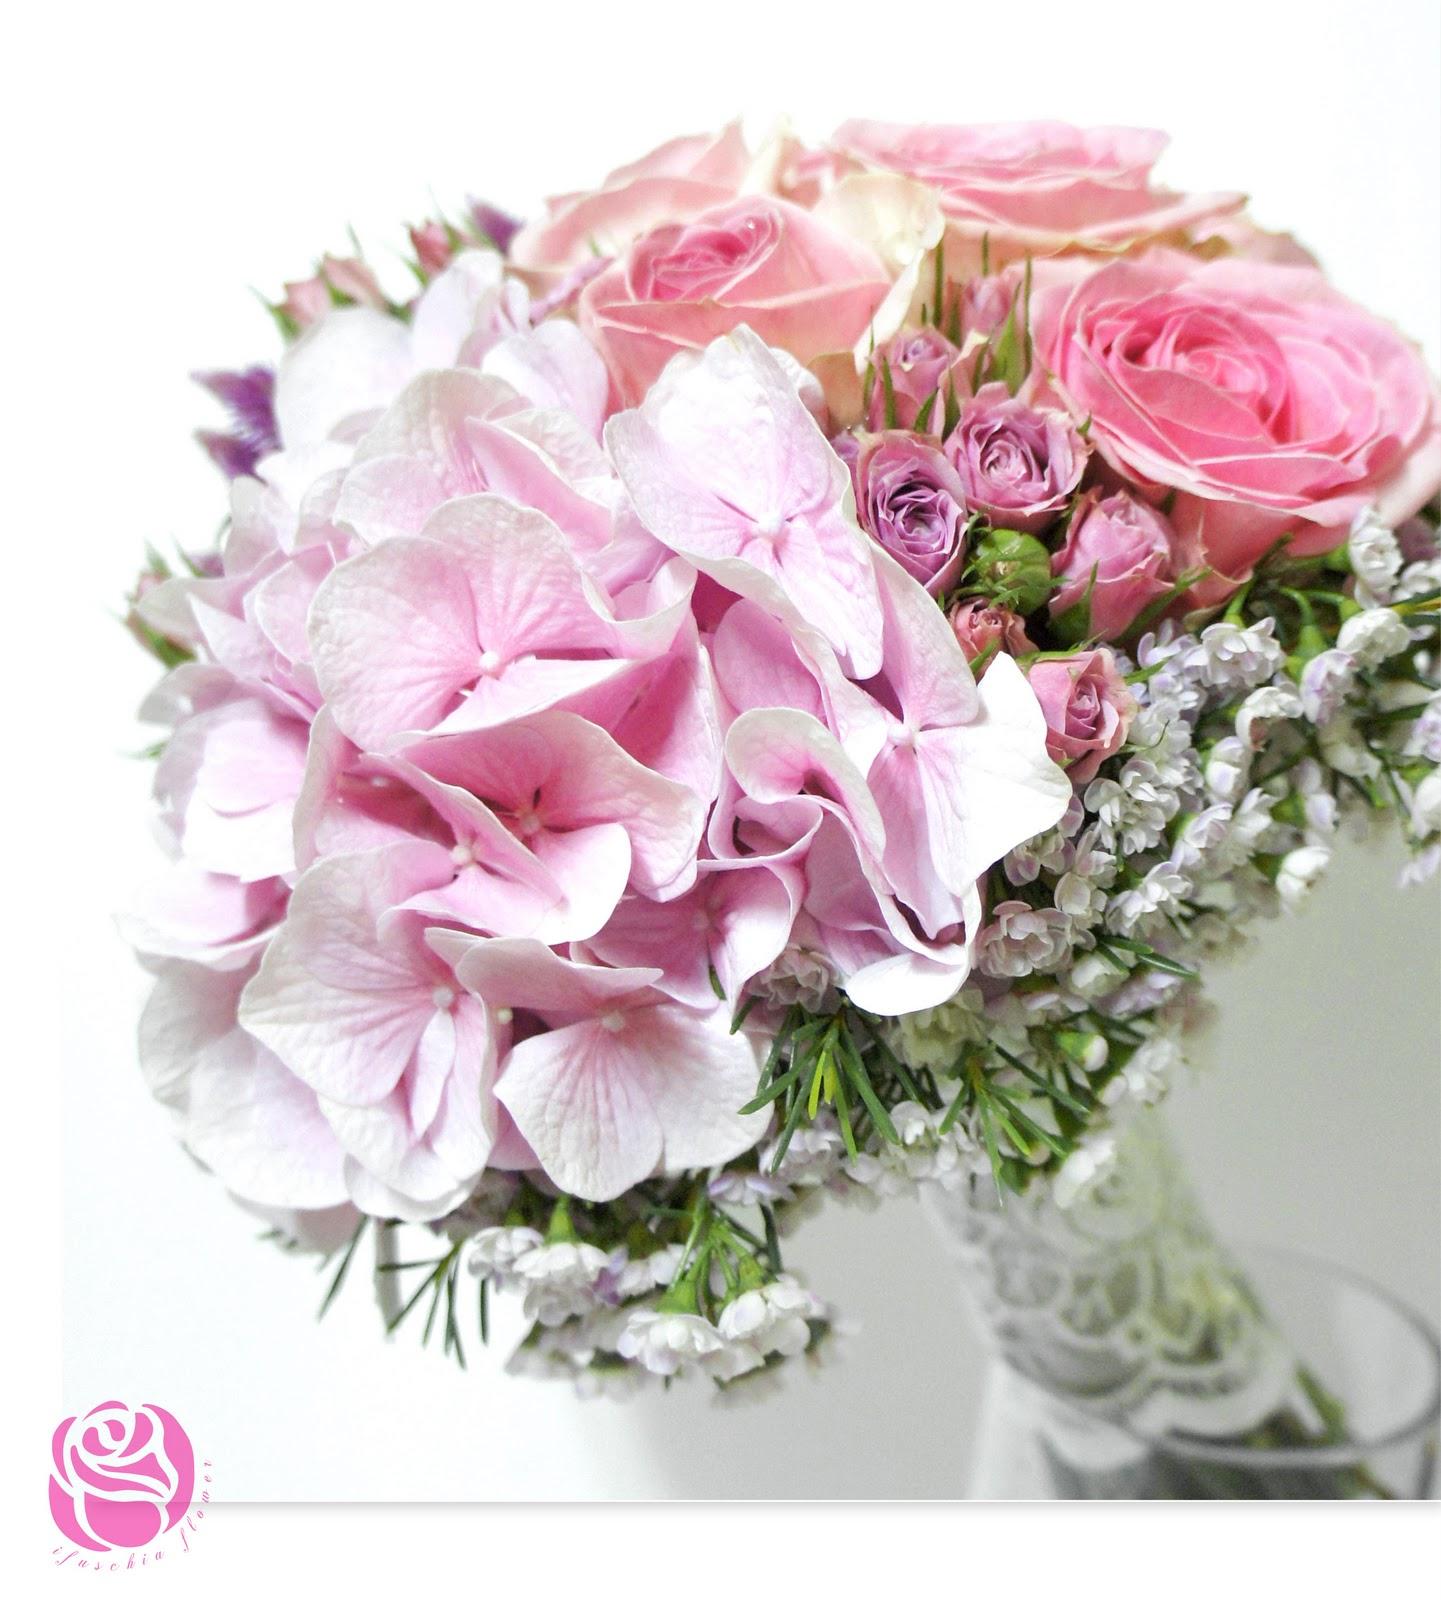 Bridal Bouquet Hk : Ifuschia flower bridal bouquet for yumi s pre